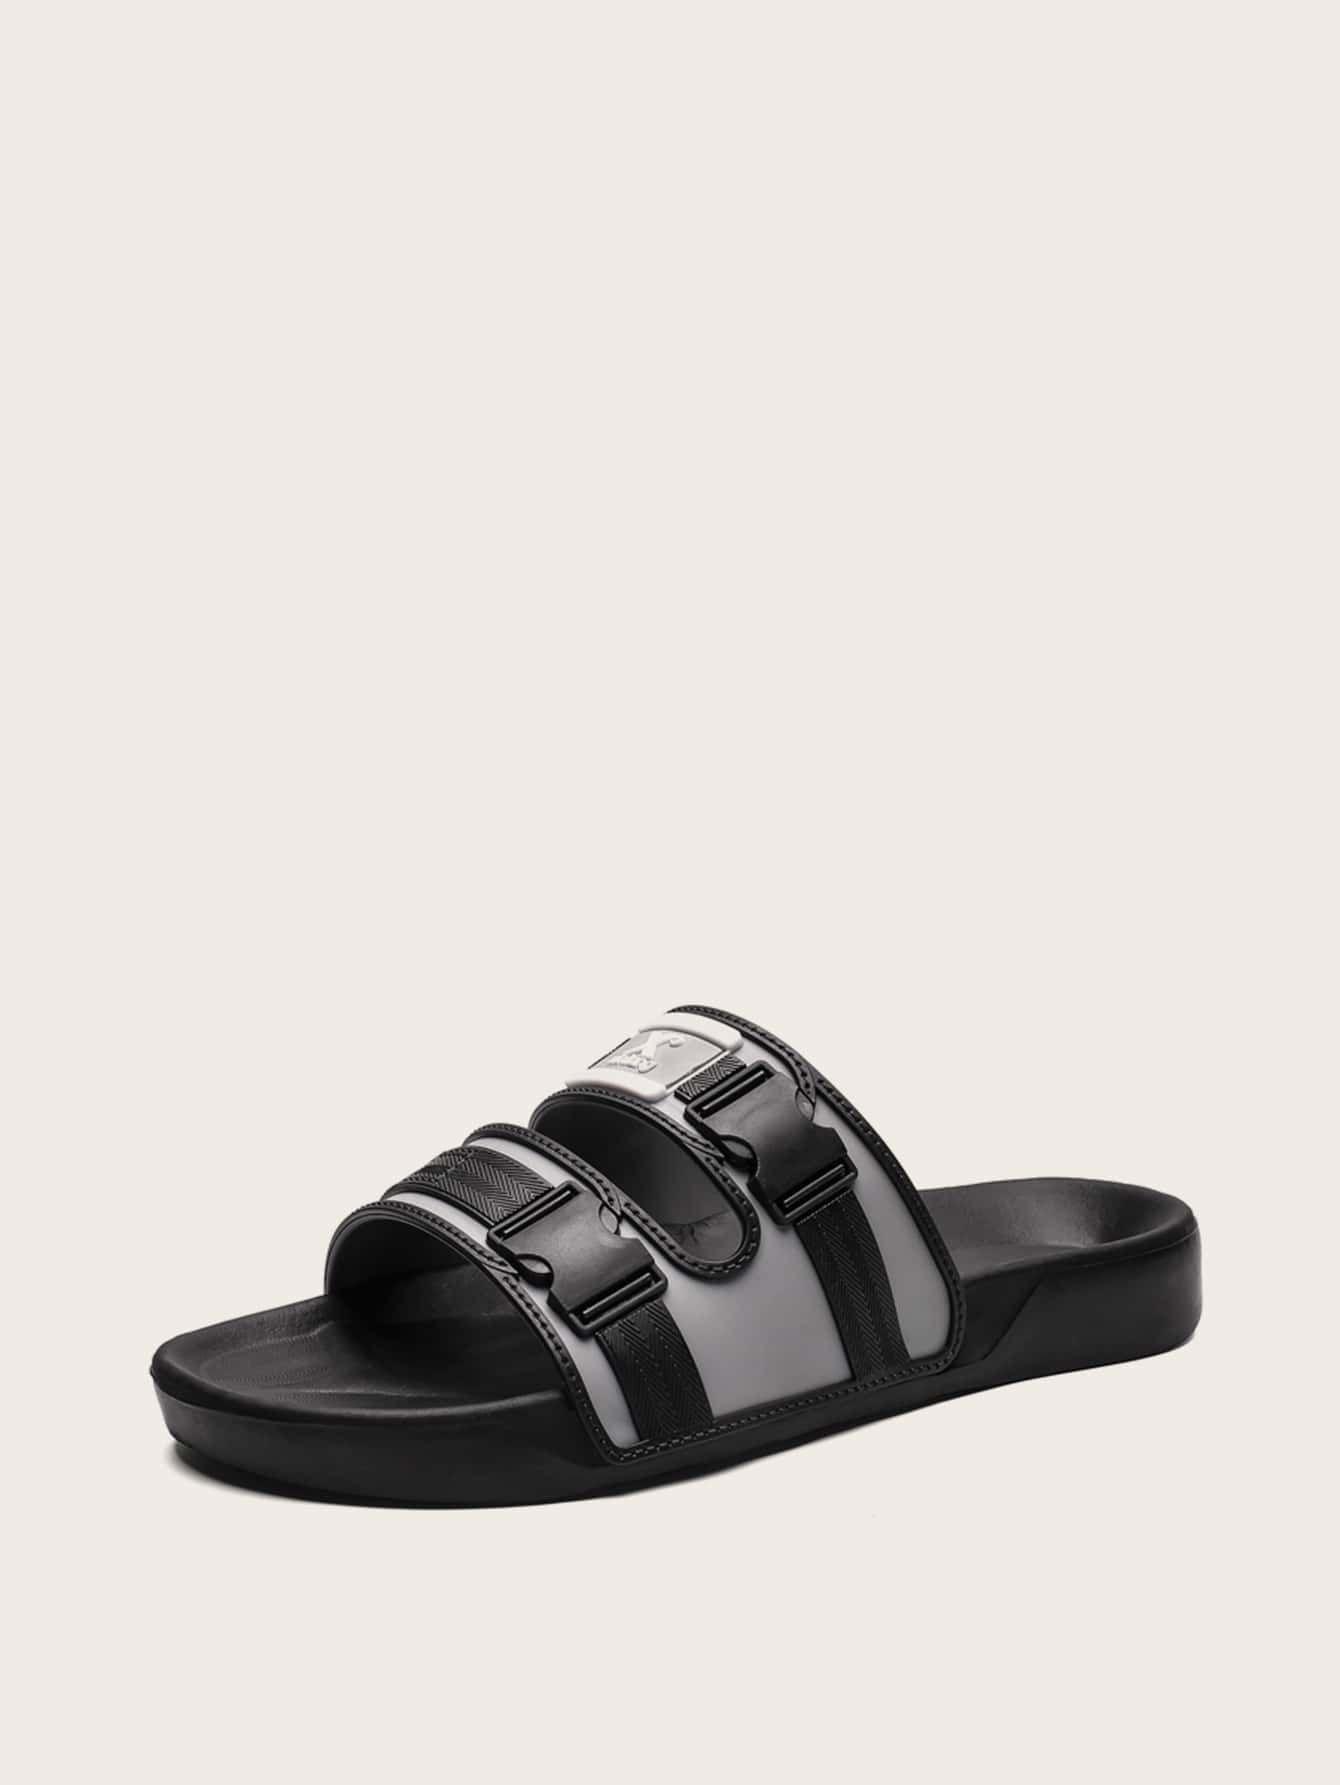 Men Open Toe Wide Fit Sandals #Ad , #Ad